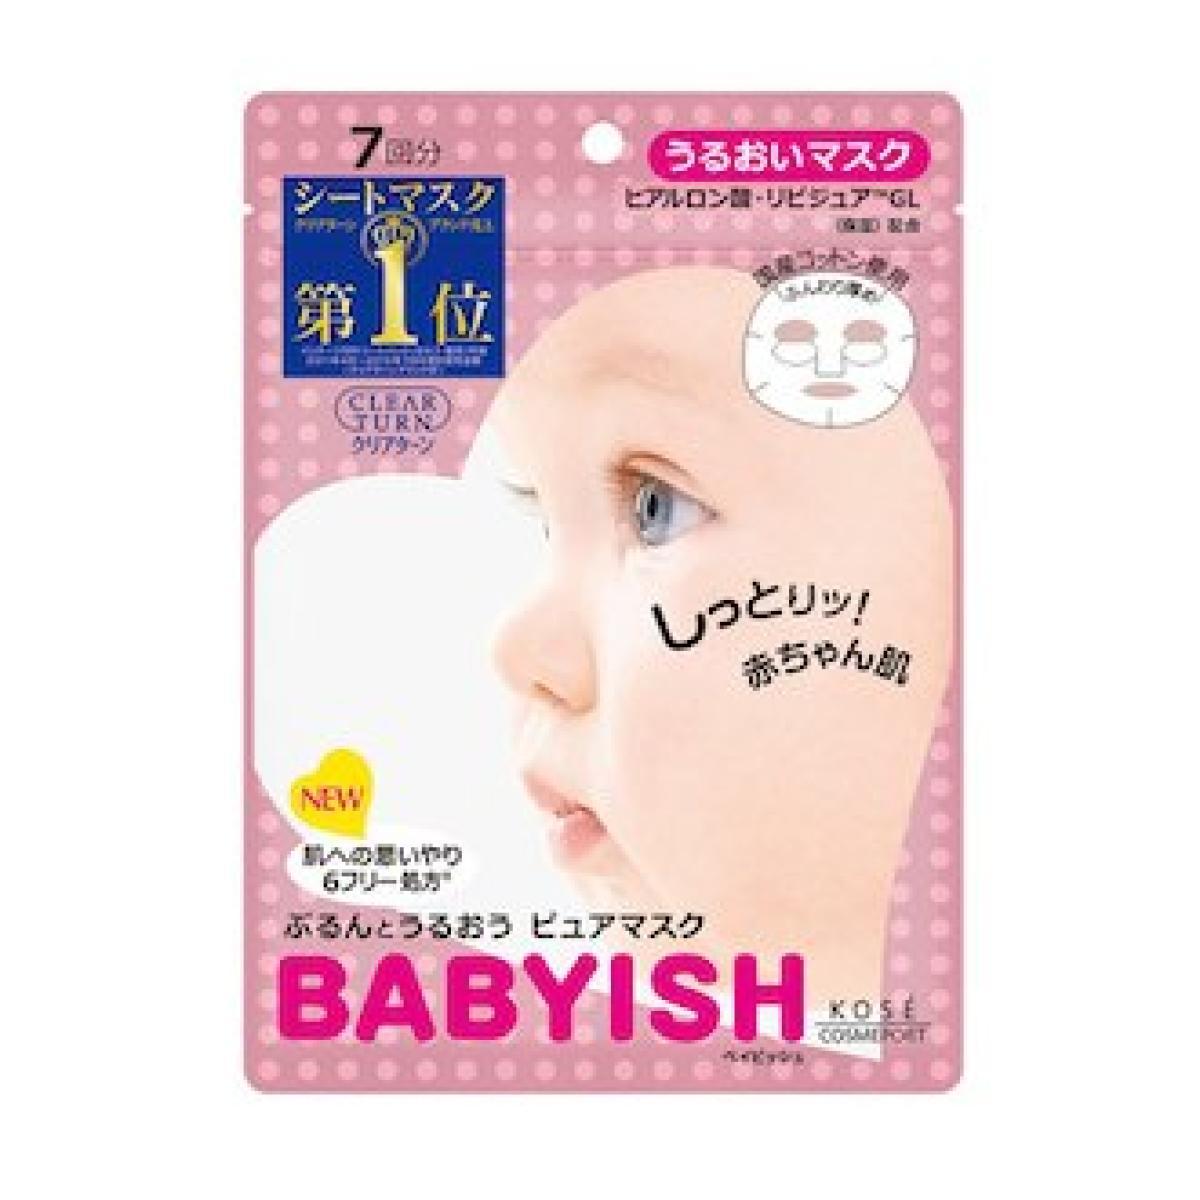 Kose - 日本 高絲 Kose Babyish Clear Turn 光映透 嬰兒肌高效保濕面膜 (粉紅色) 1包7片